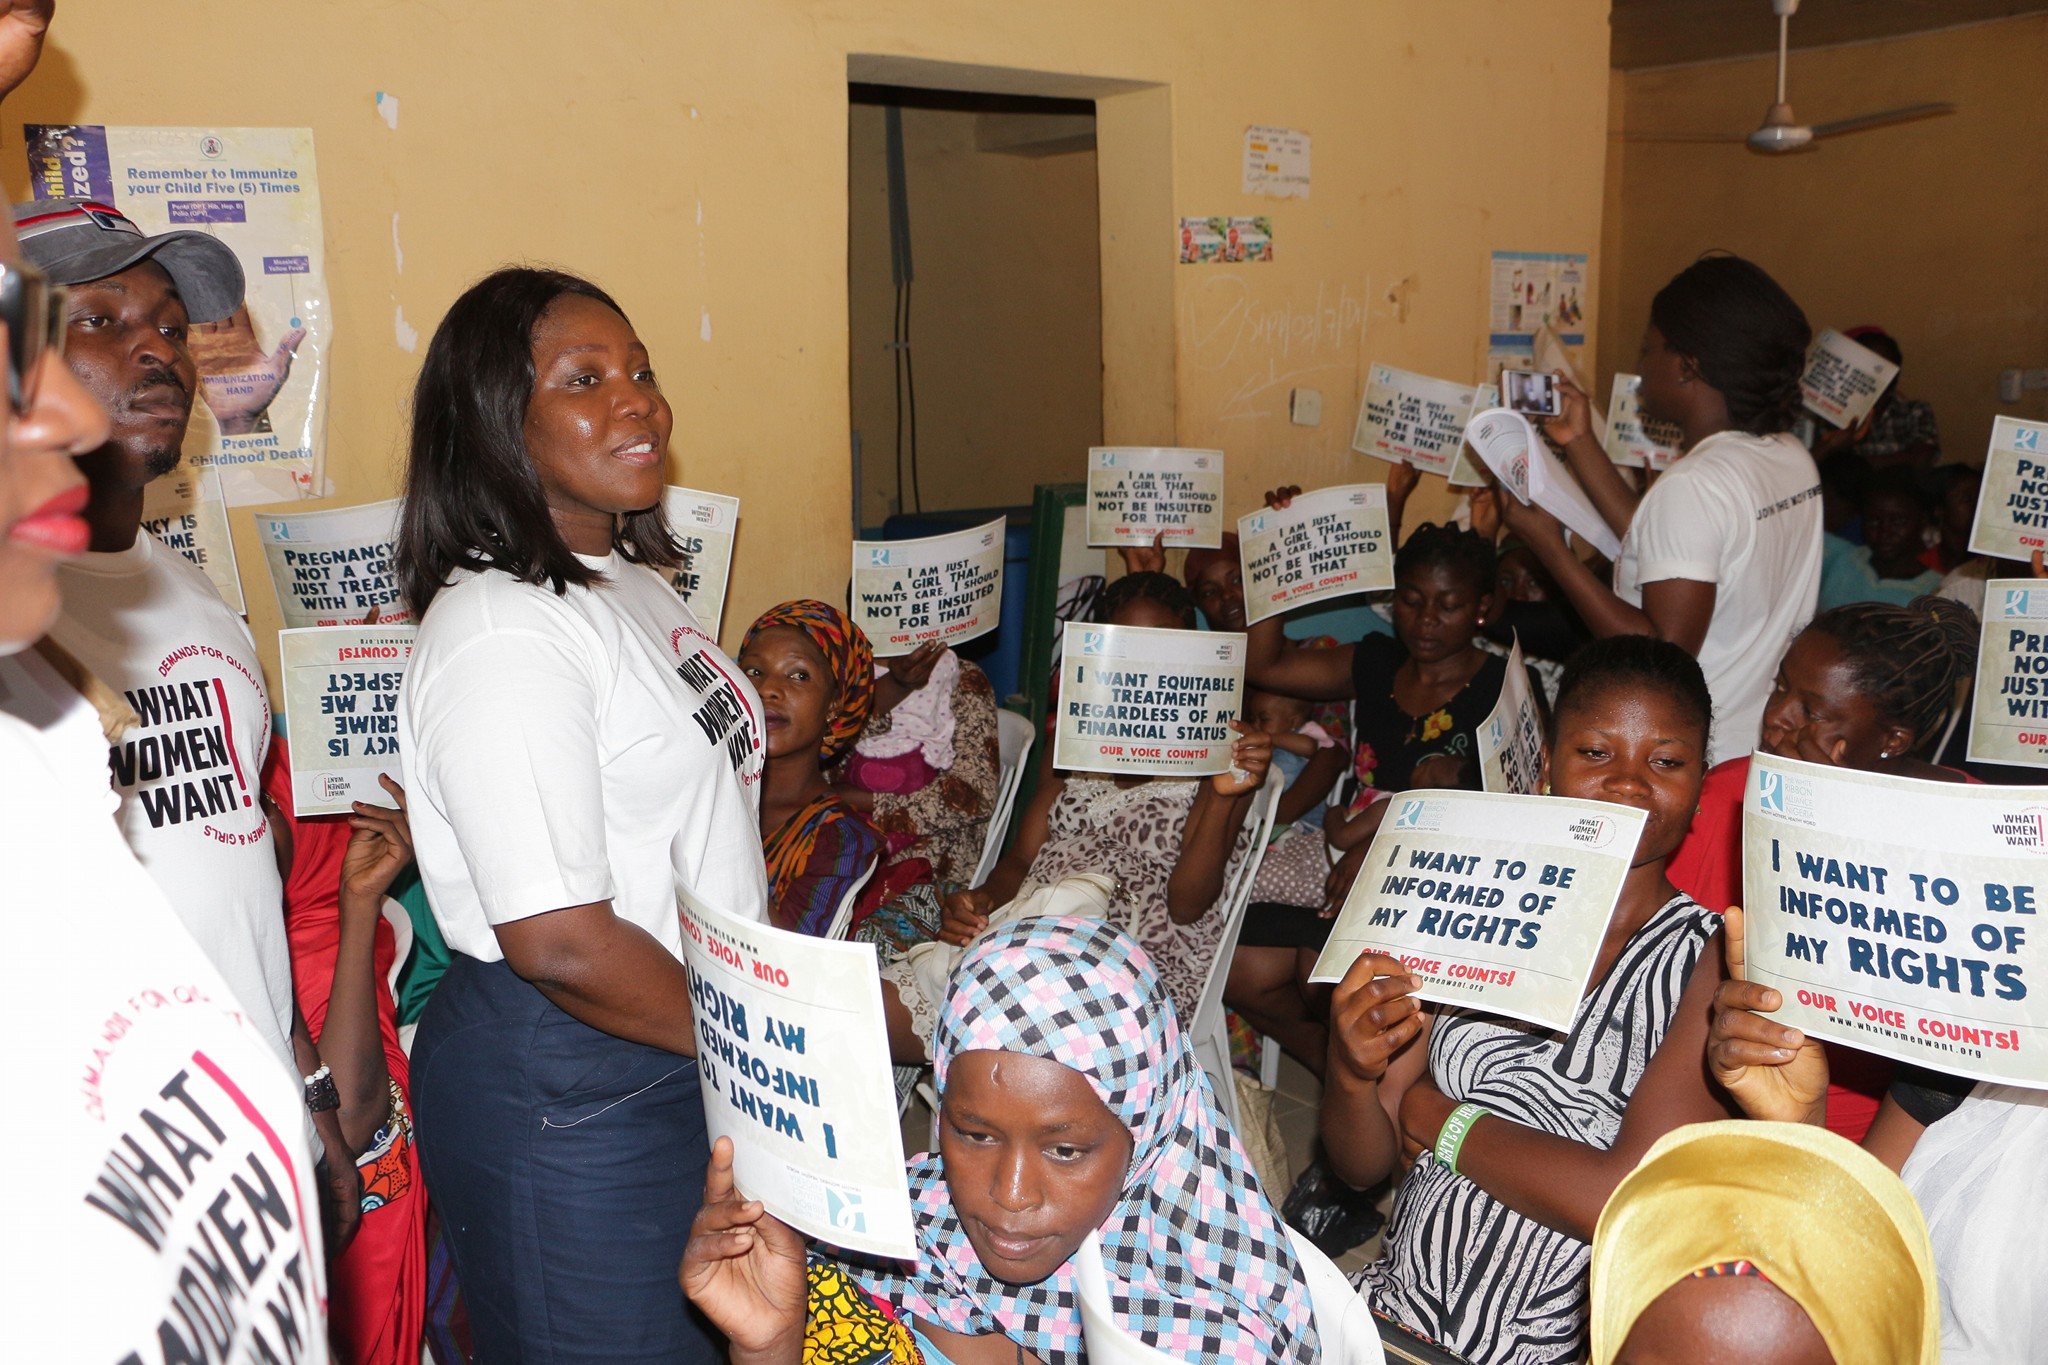 Mobilization_Nigeria_WRA Nigeria_Nigeria_Group.jpg